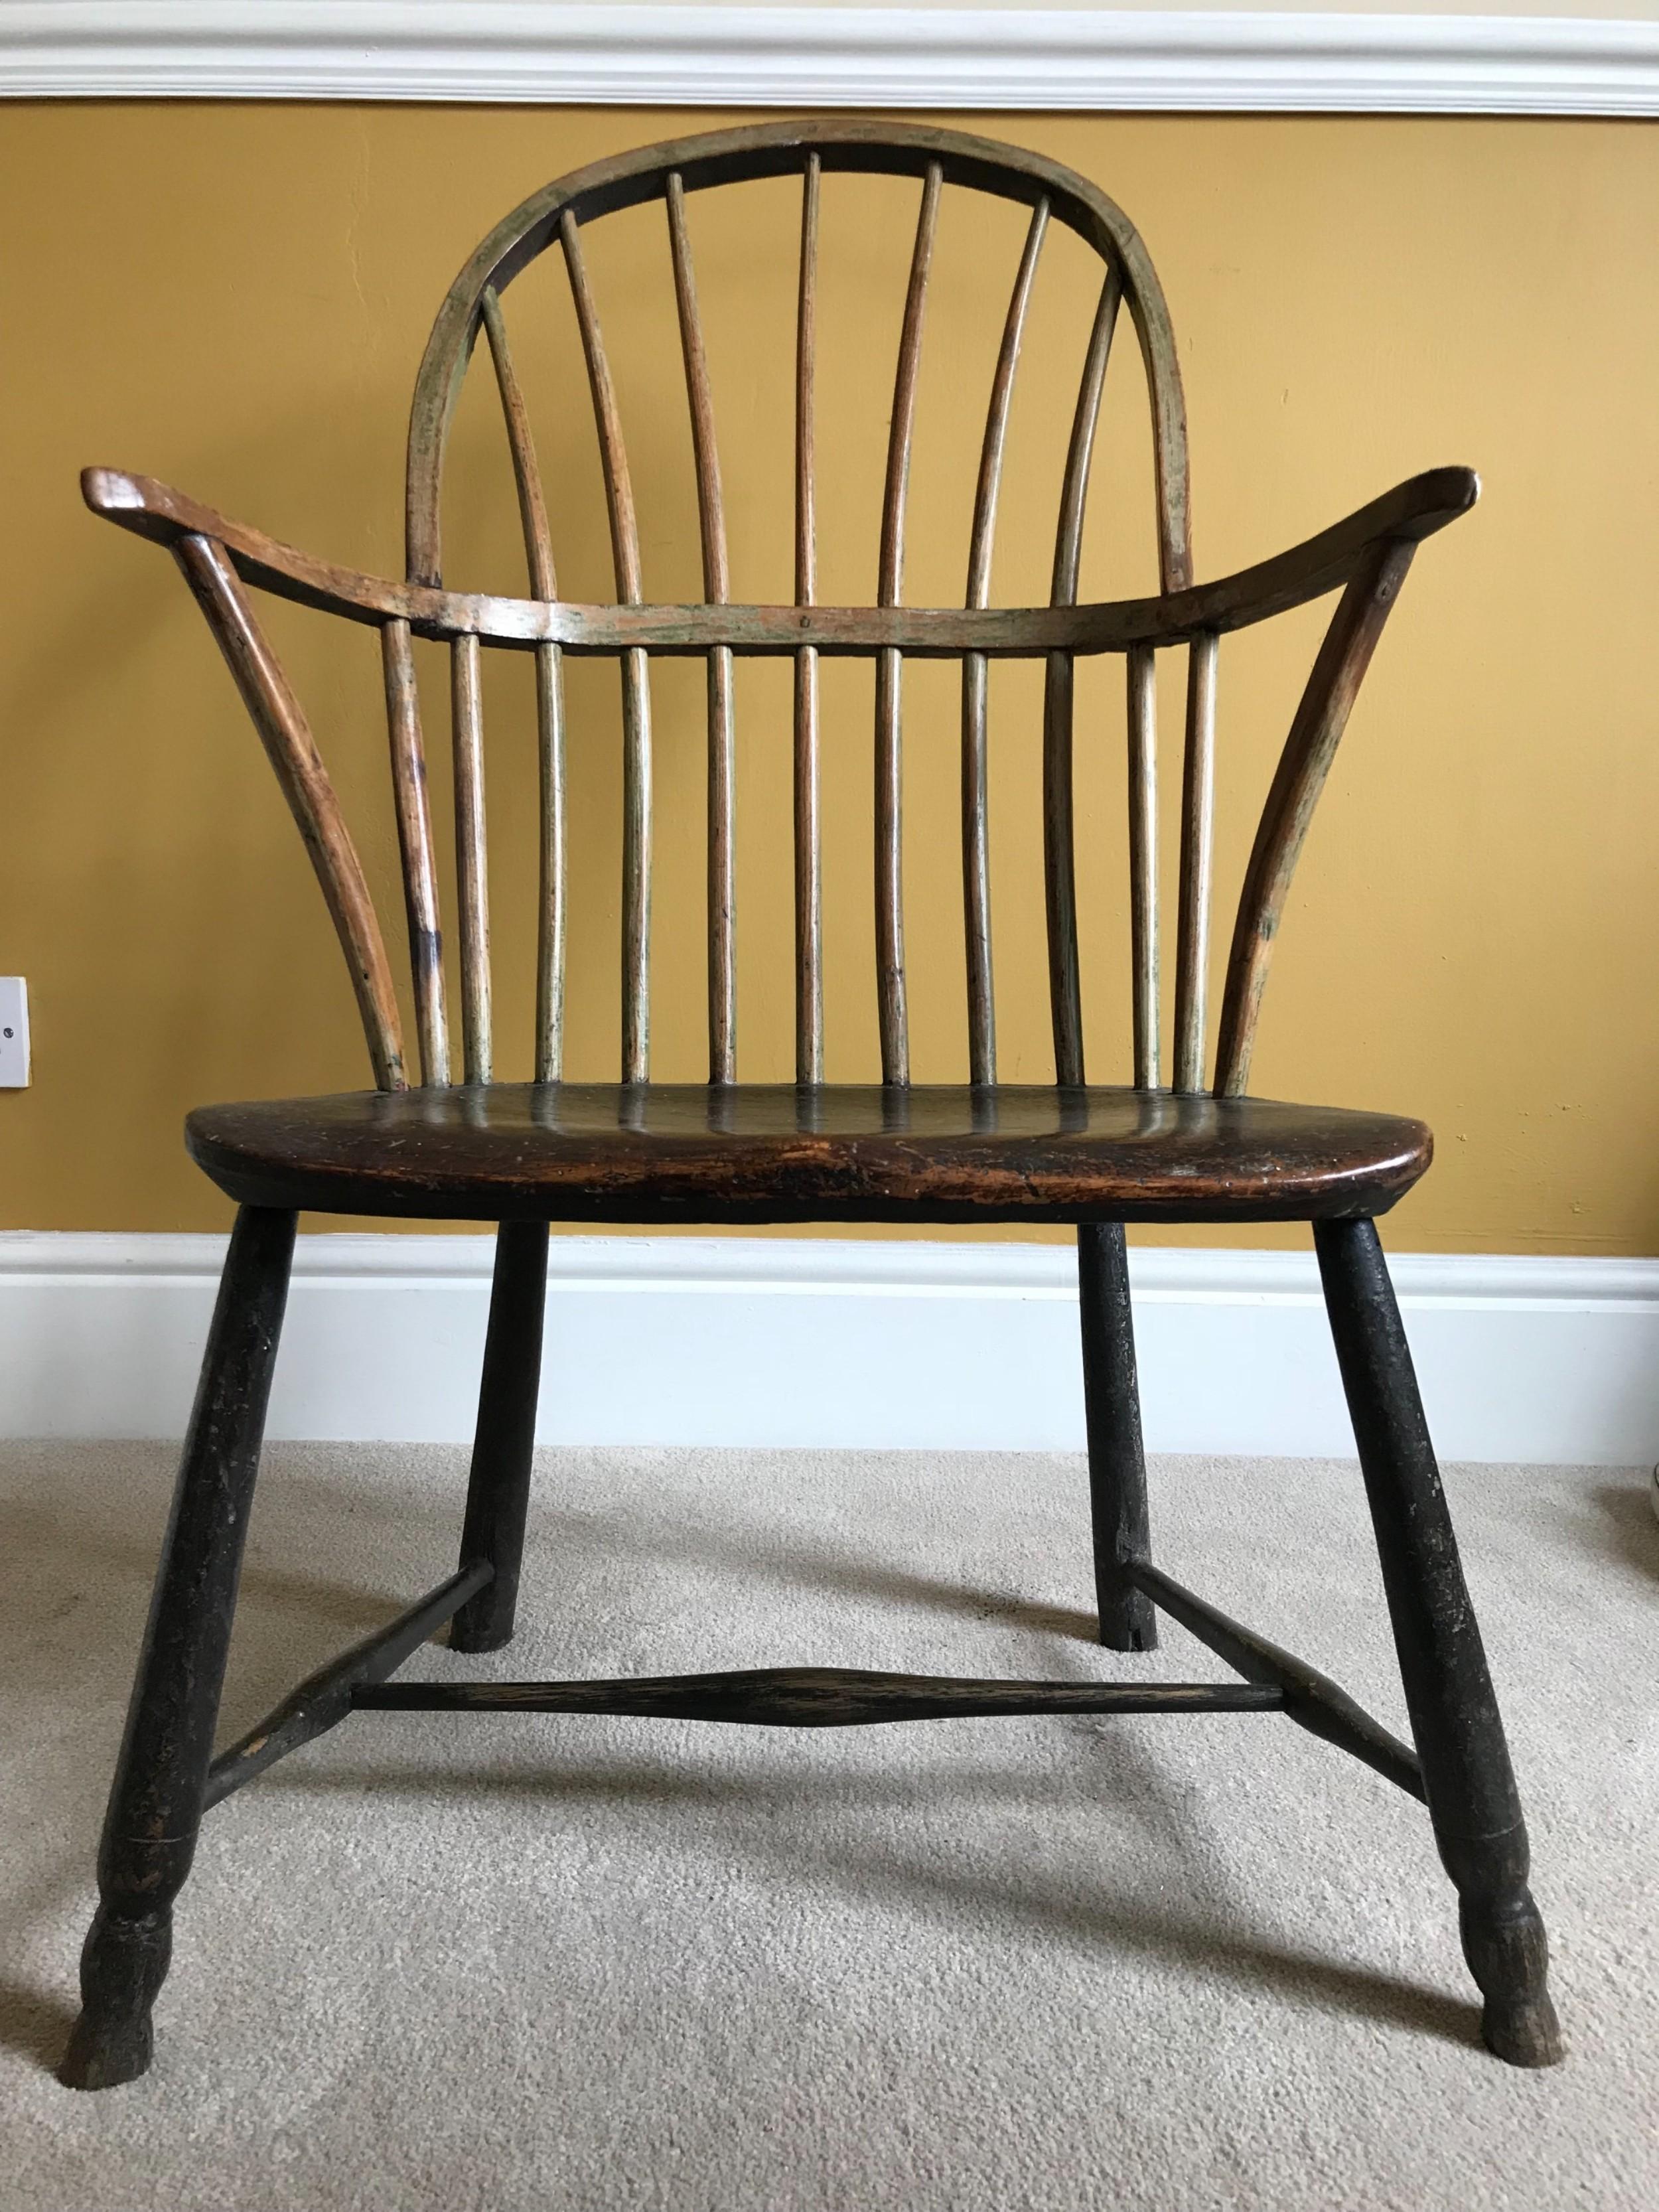 18thc cornish regional chair